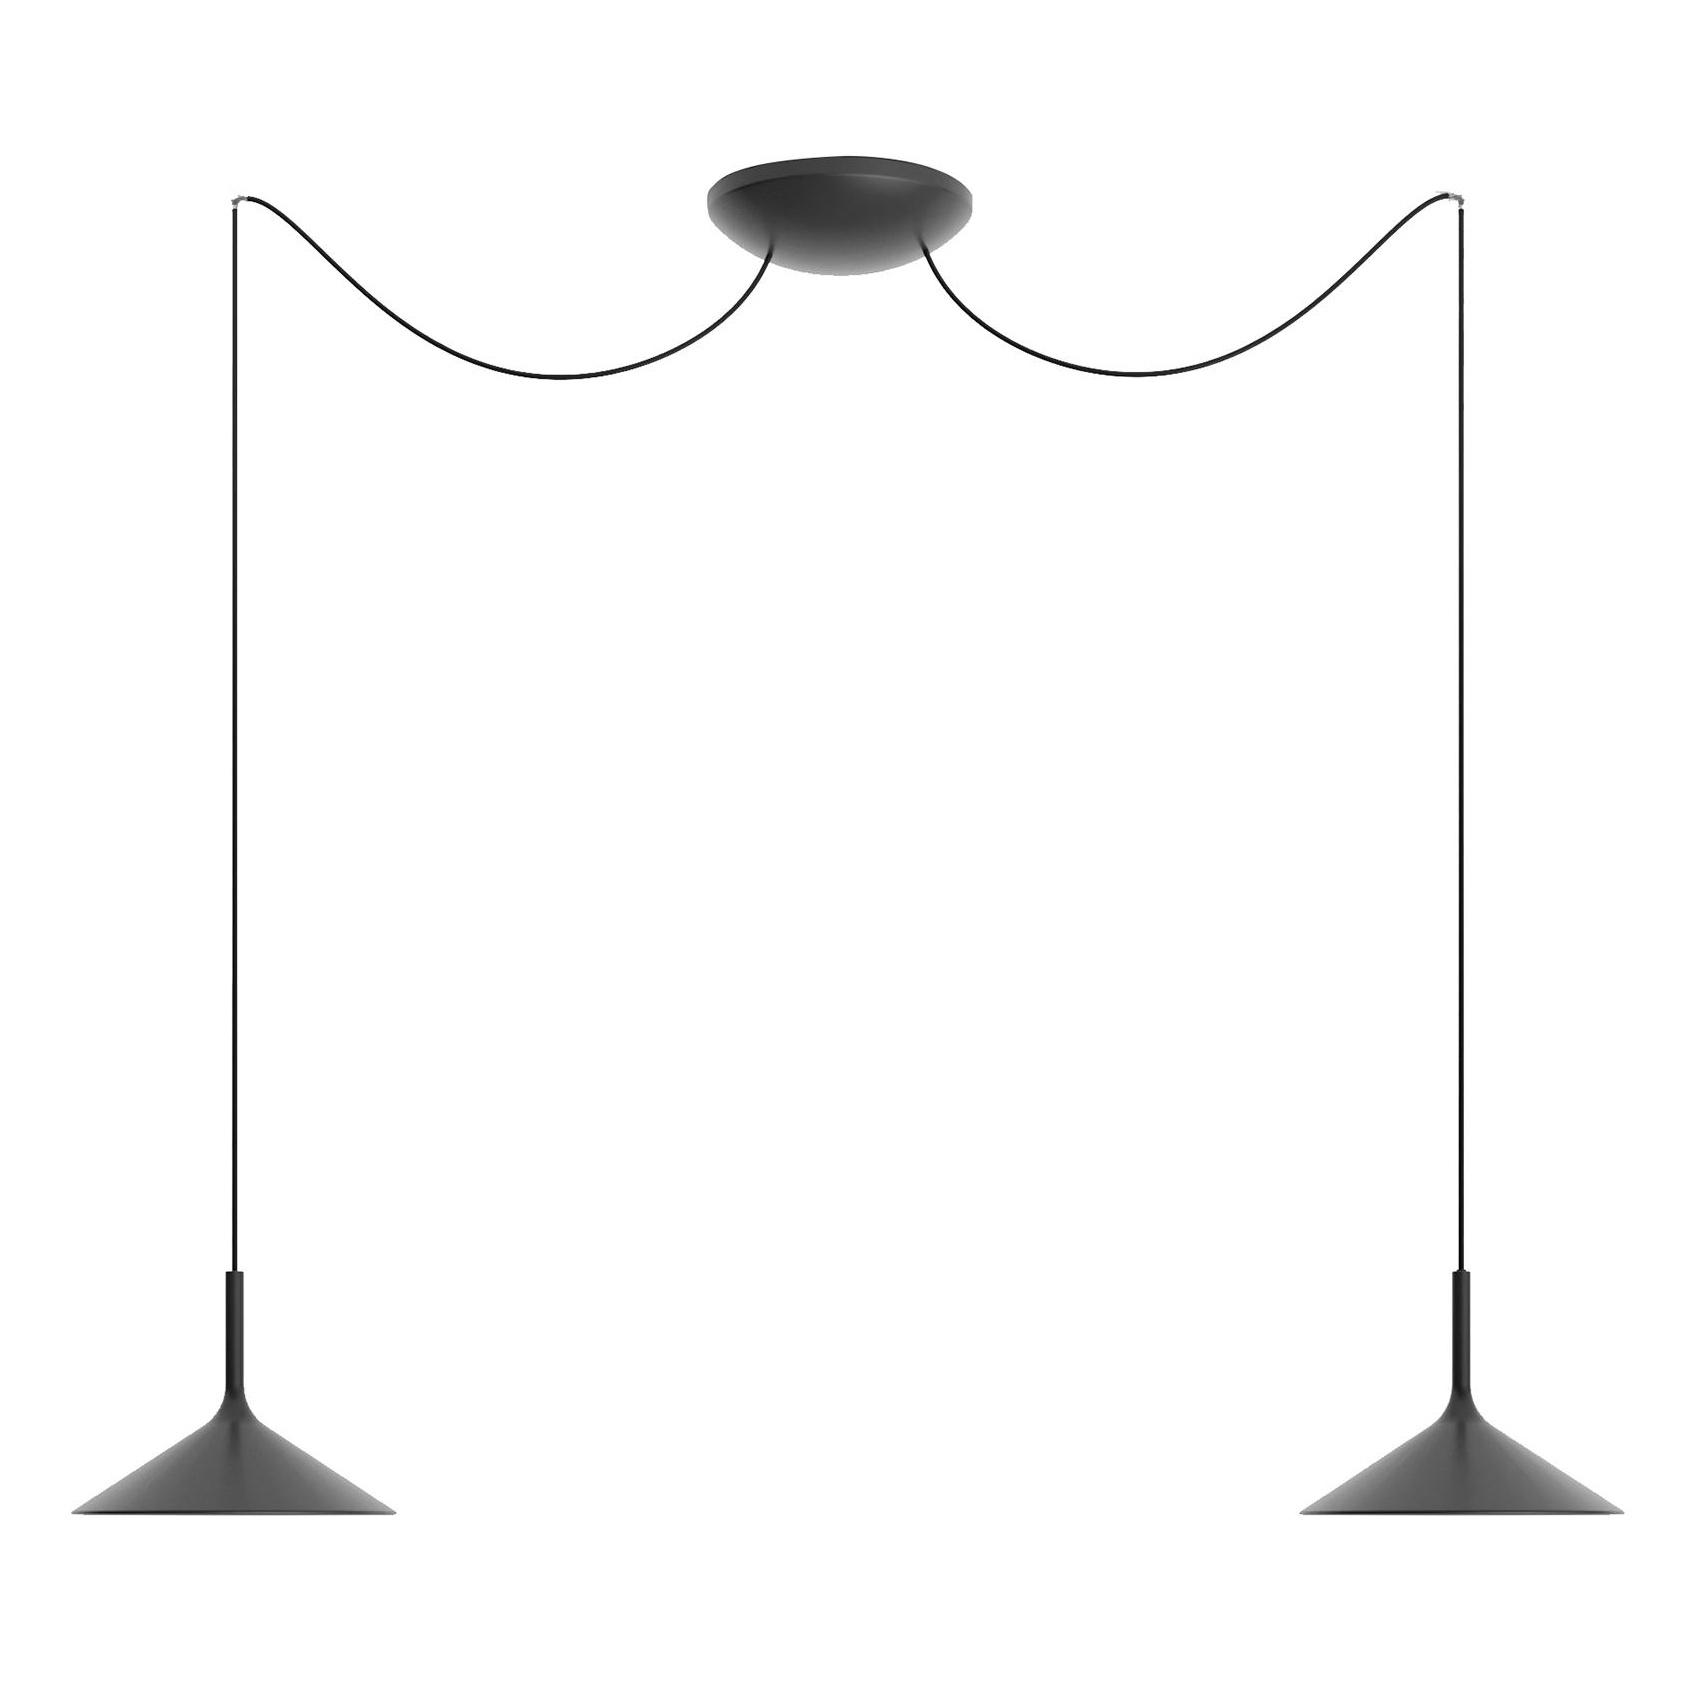 Rotaliana - Dry H2 LED Pendelleuchte - schwarz/matt/H 20cm / Ø 26,5cm/2700K günstig online kaufen